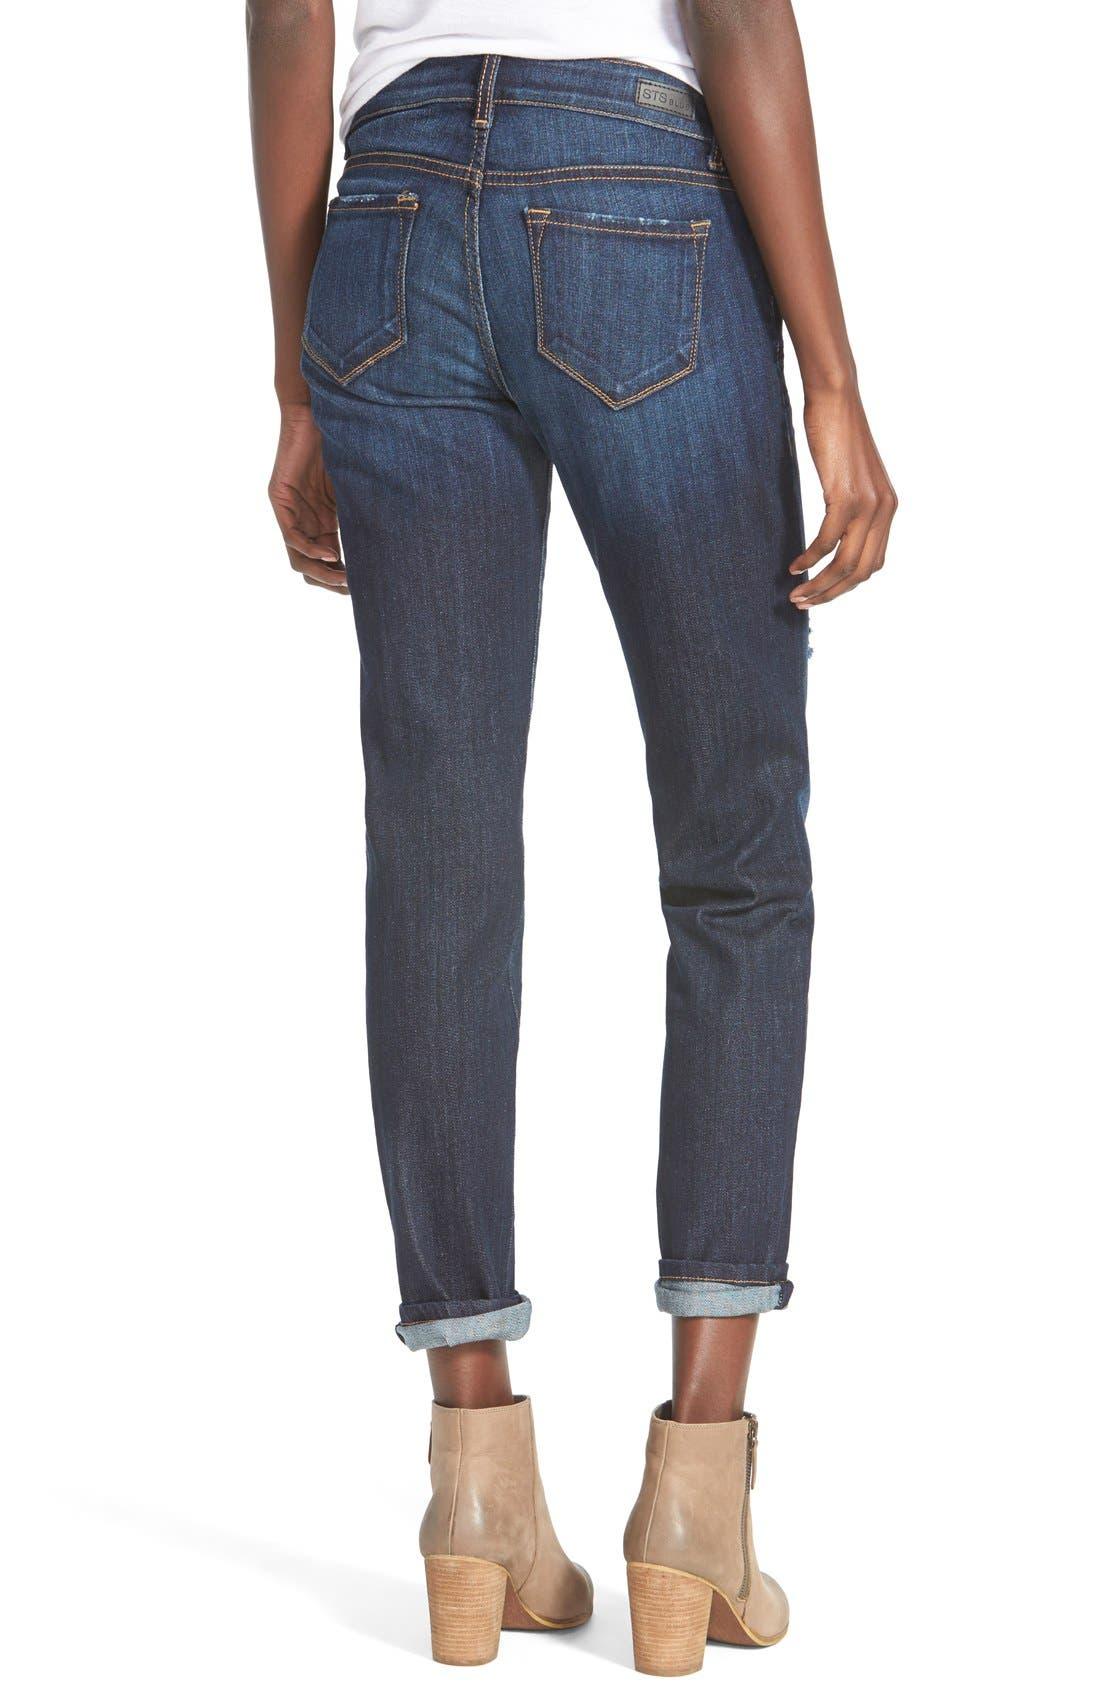 Alternate Image 2  - STS Blue 'Joey' Boyfriend Jeans (Sonoma Wash)